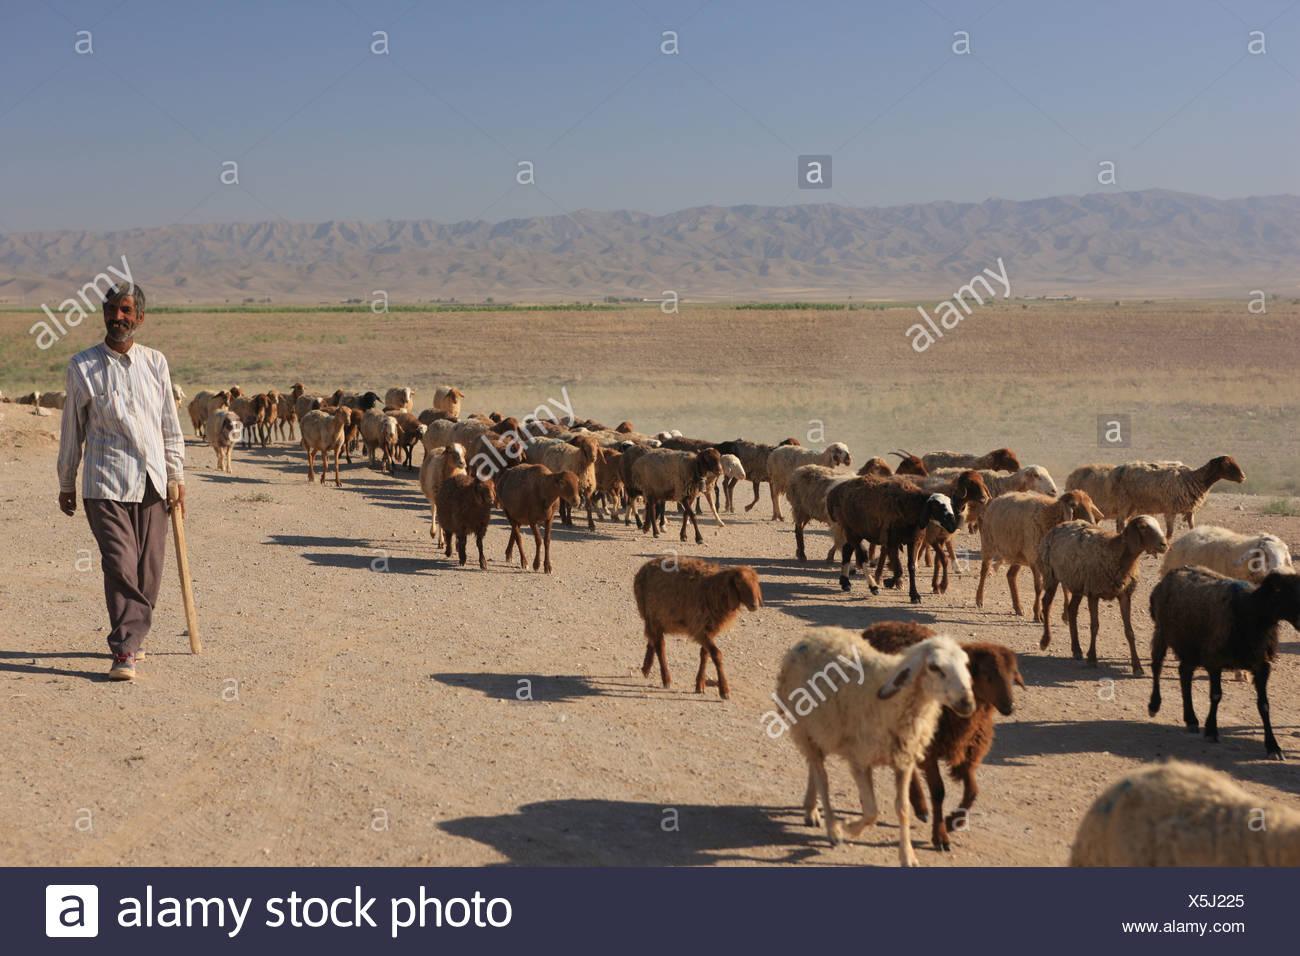 herd, flock, drove flocks. sheep, lamp, shepherd, animals, livestock, pasturage, Iran, silk road, man, on the way, en route, in - Stock Image